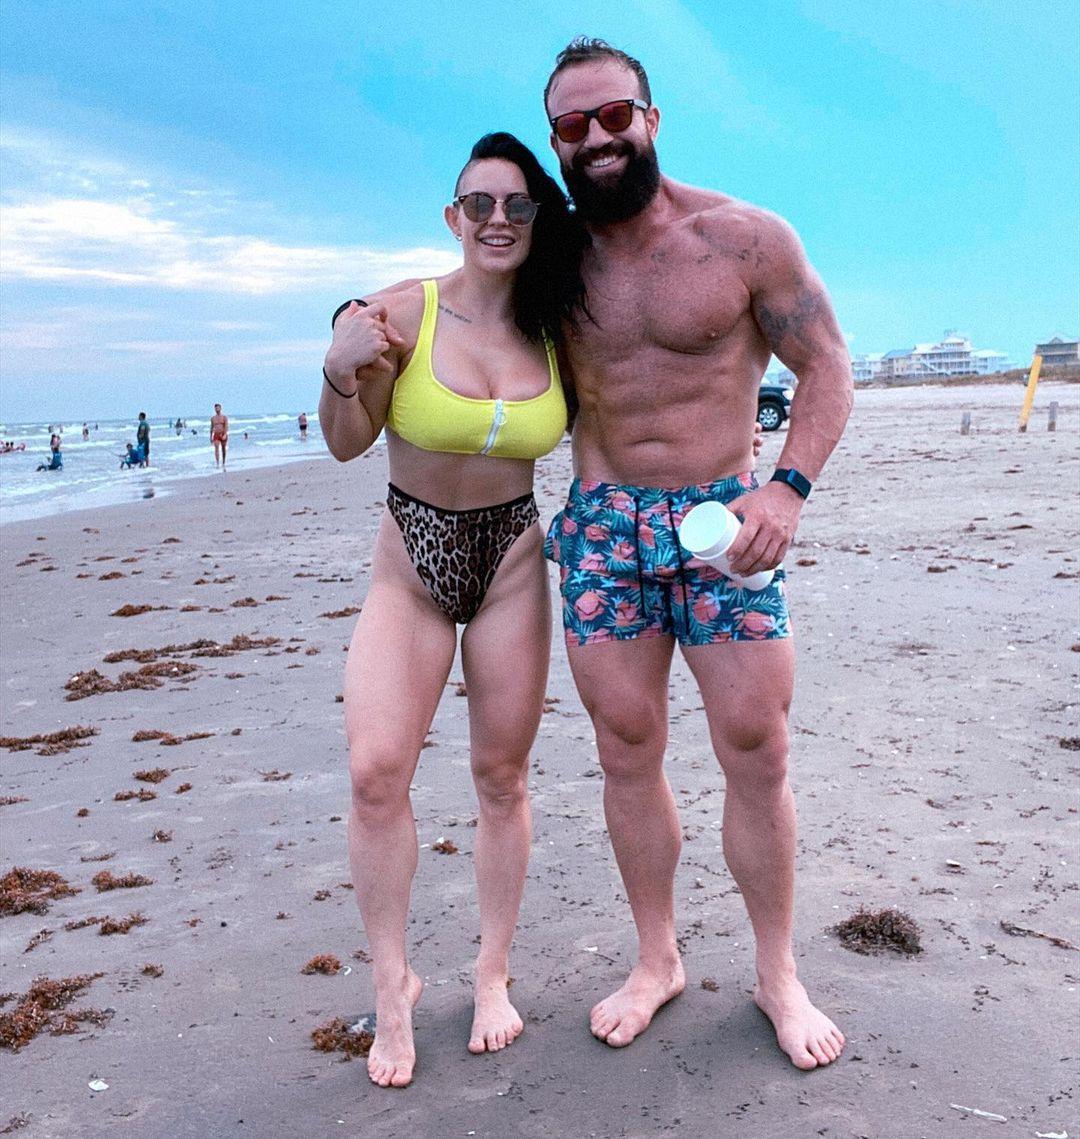 Celeste Bonin Nude Leaked The Fappening & Sexy 0019